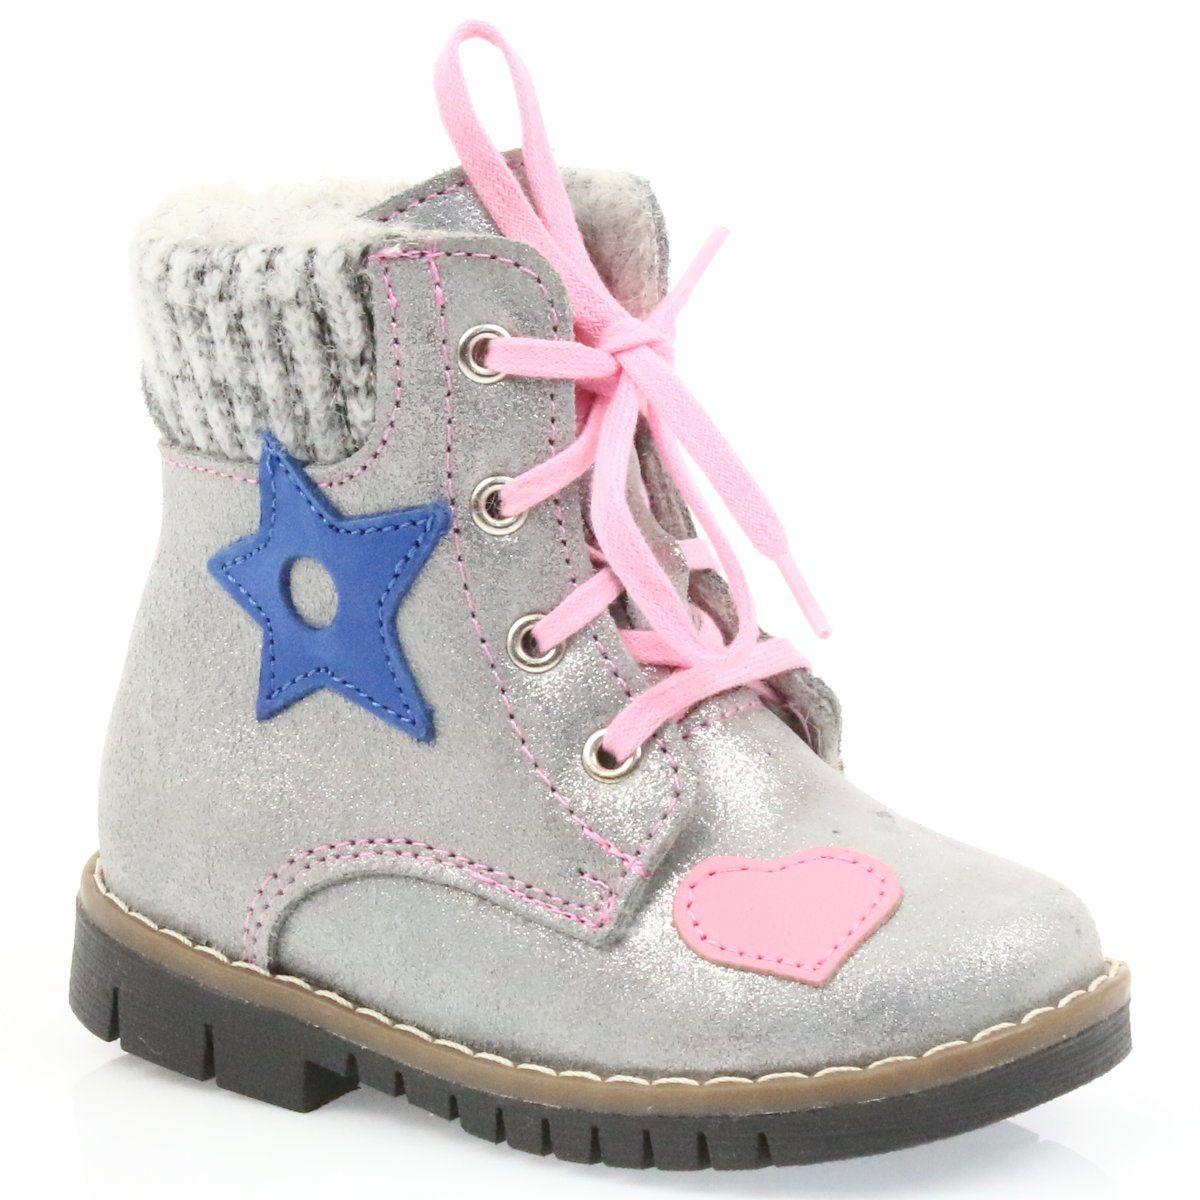 Kozaczki Timberki Ren But 1508 Szare Boots Baby Shoes Shoes